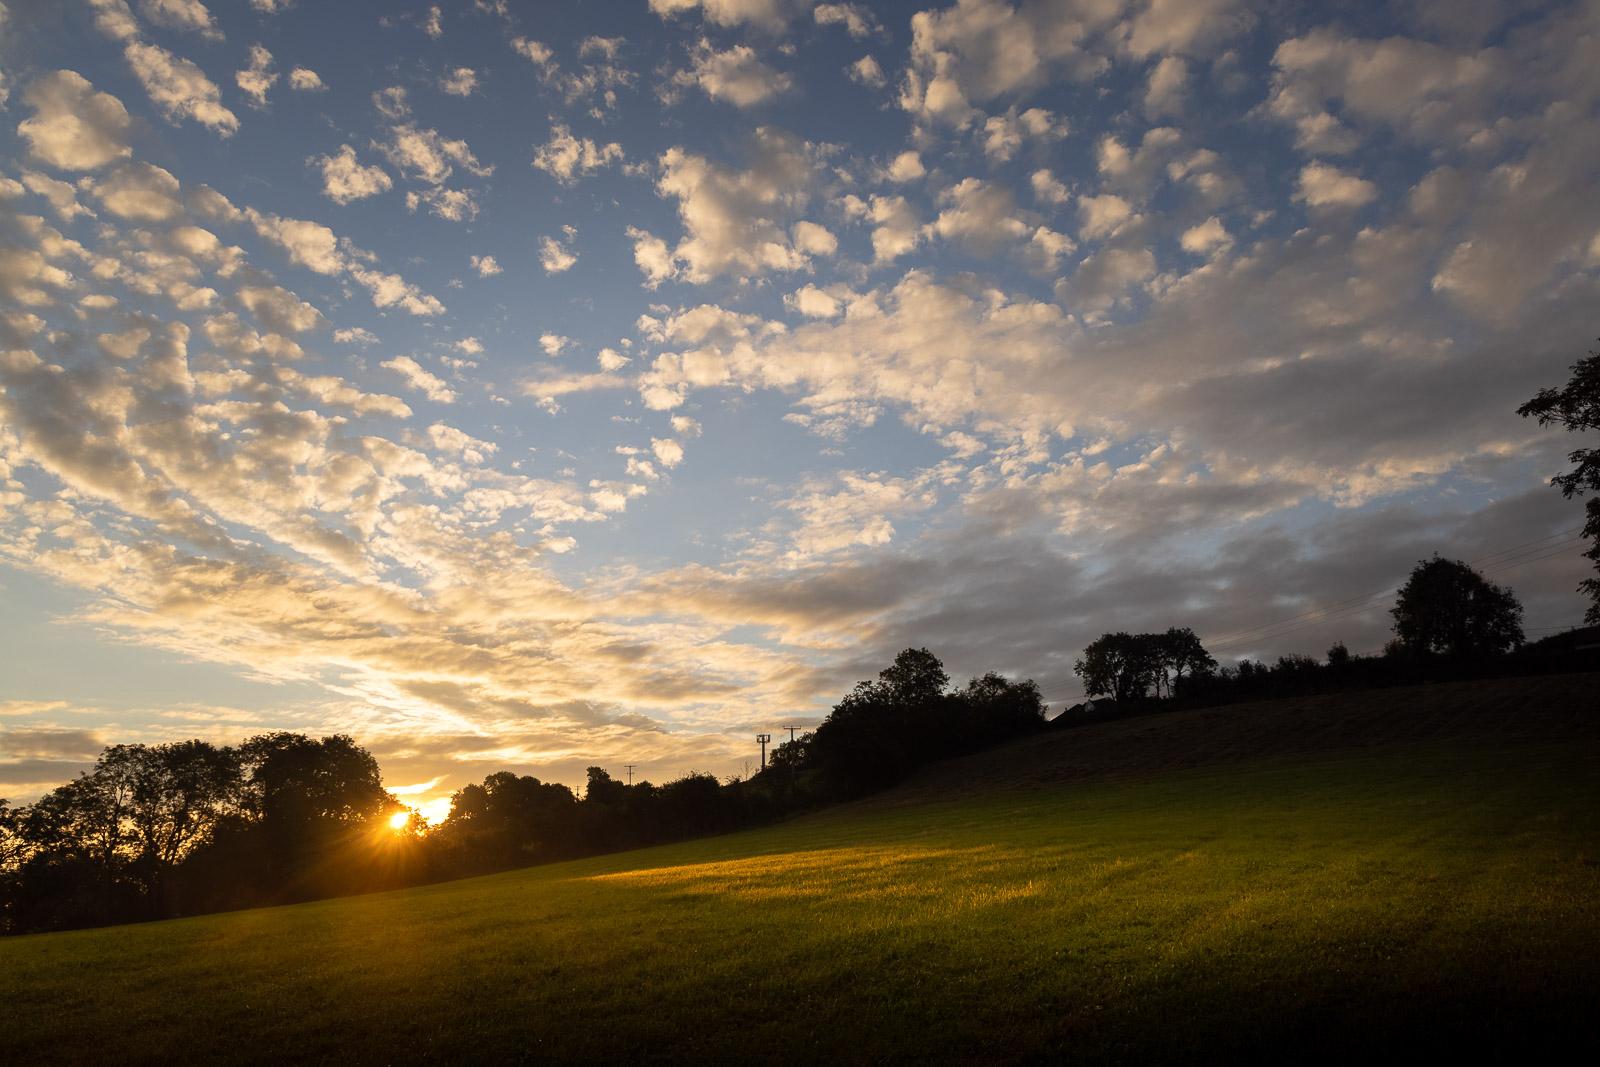 Sunrise at Bagley Fields - Nr Wedmore, Somerset, UK. ID BR55822